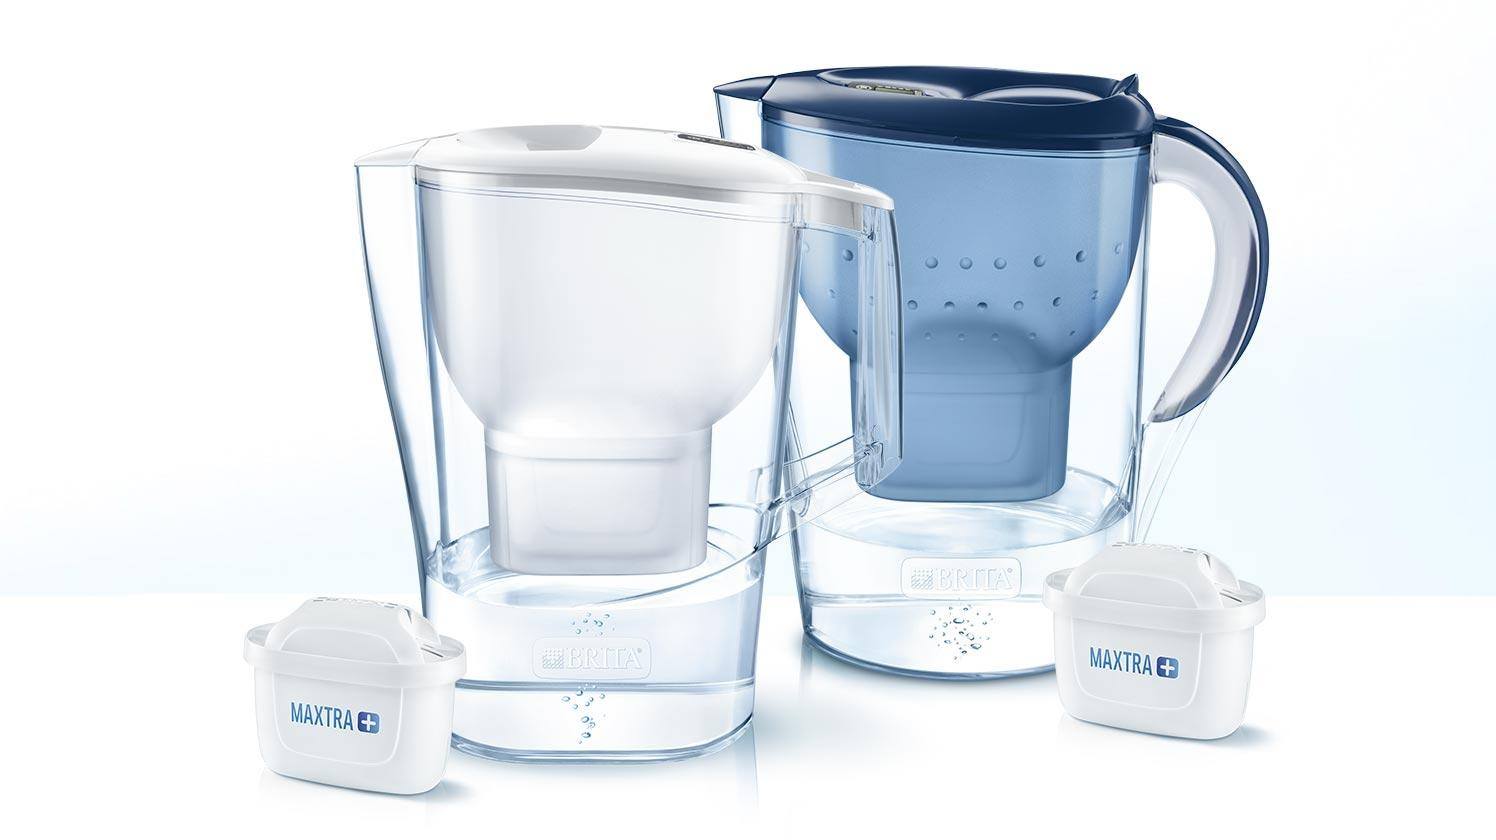 BRITA filters & MAXTRA+ filterpatronen: Verpakking